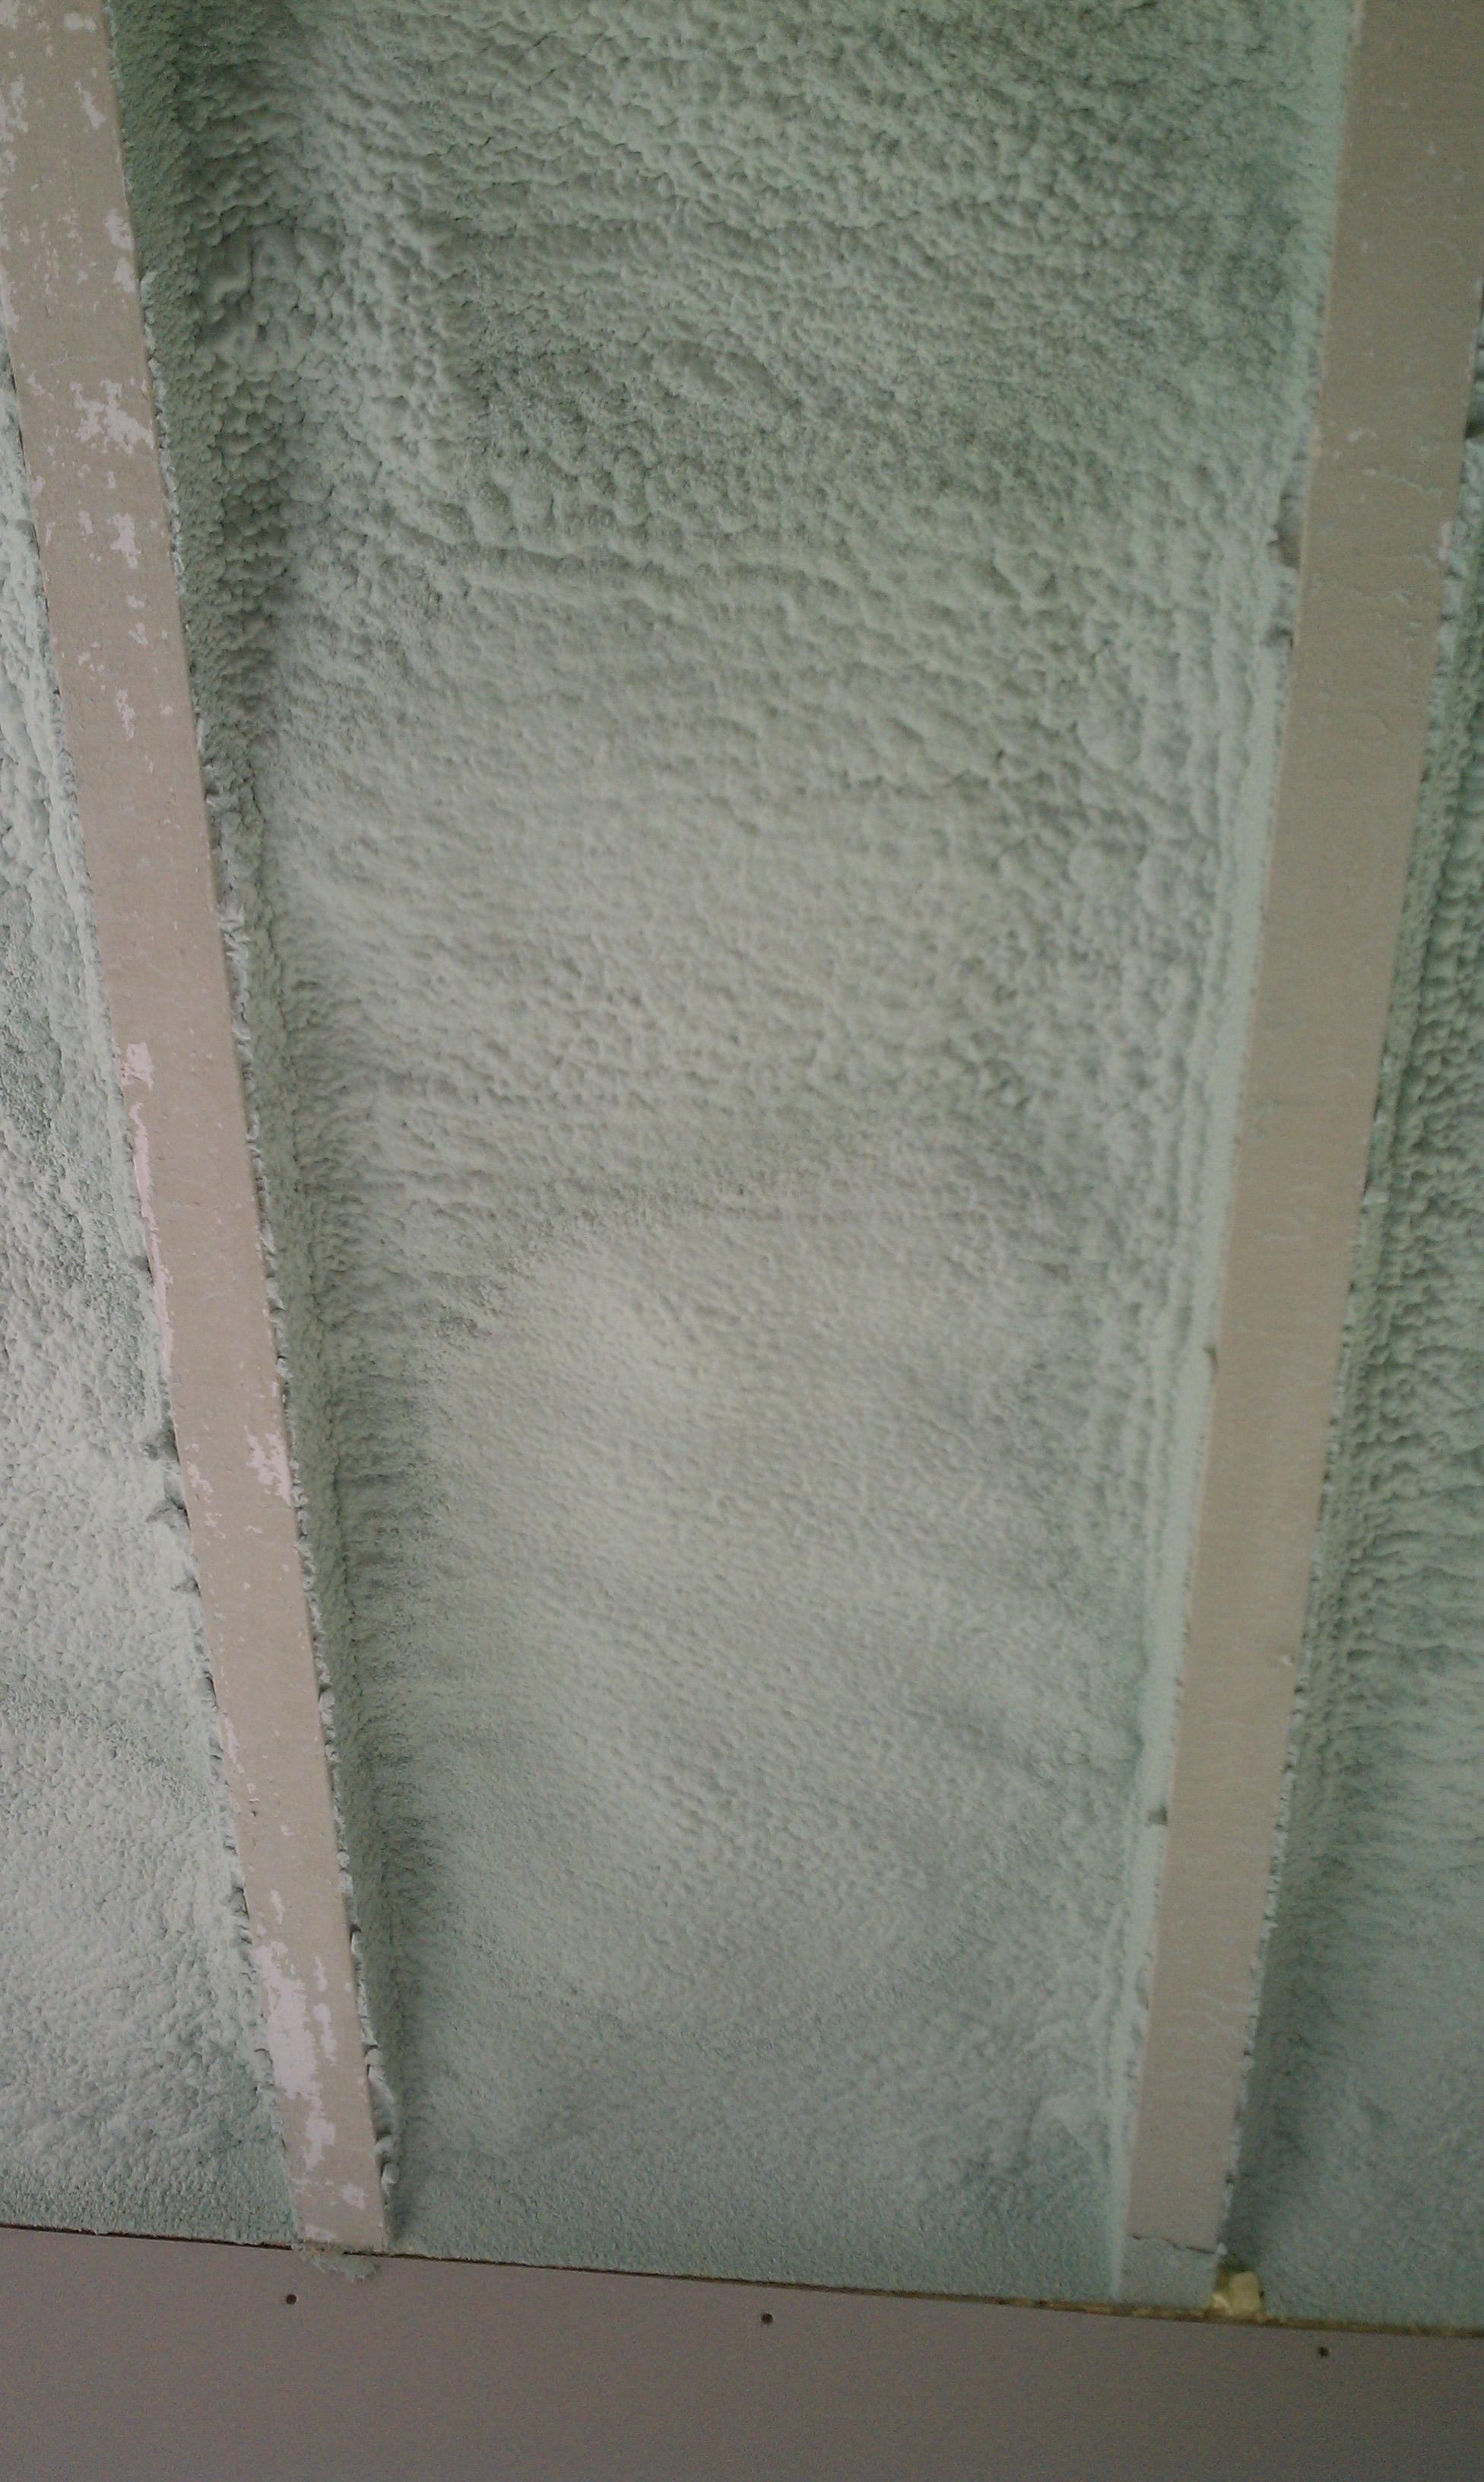 Agl Spray Foam Insulation Sharon Hill Pa 19079 Angies